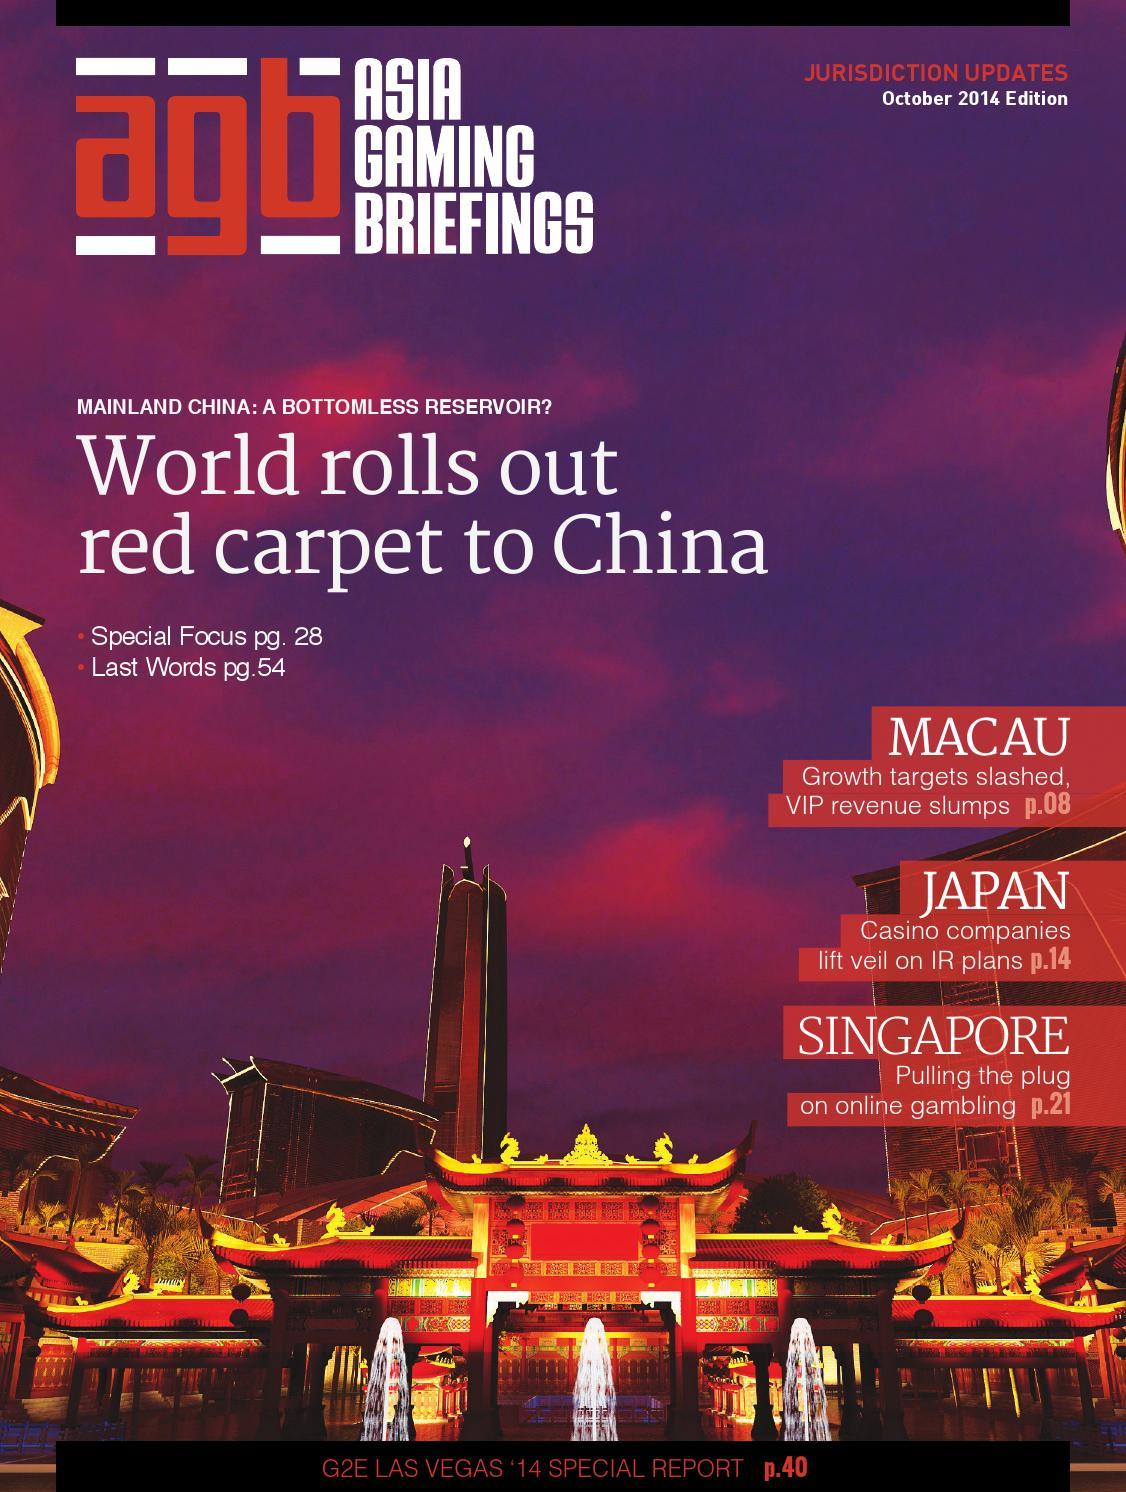 China lotsynergy igt the vic casino